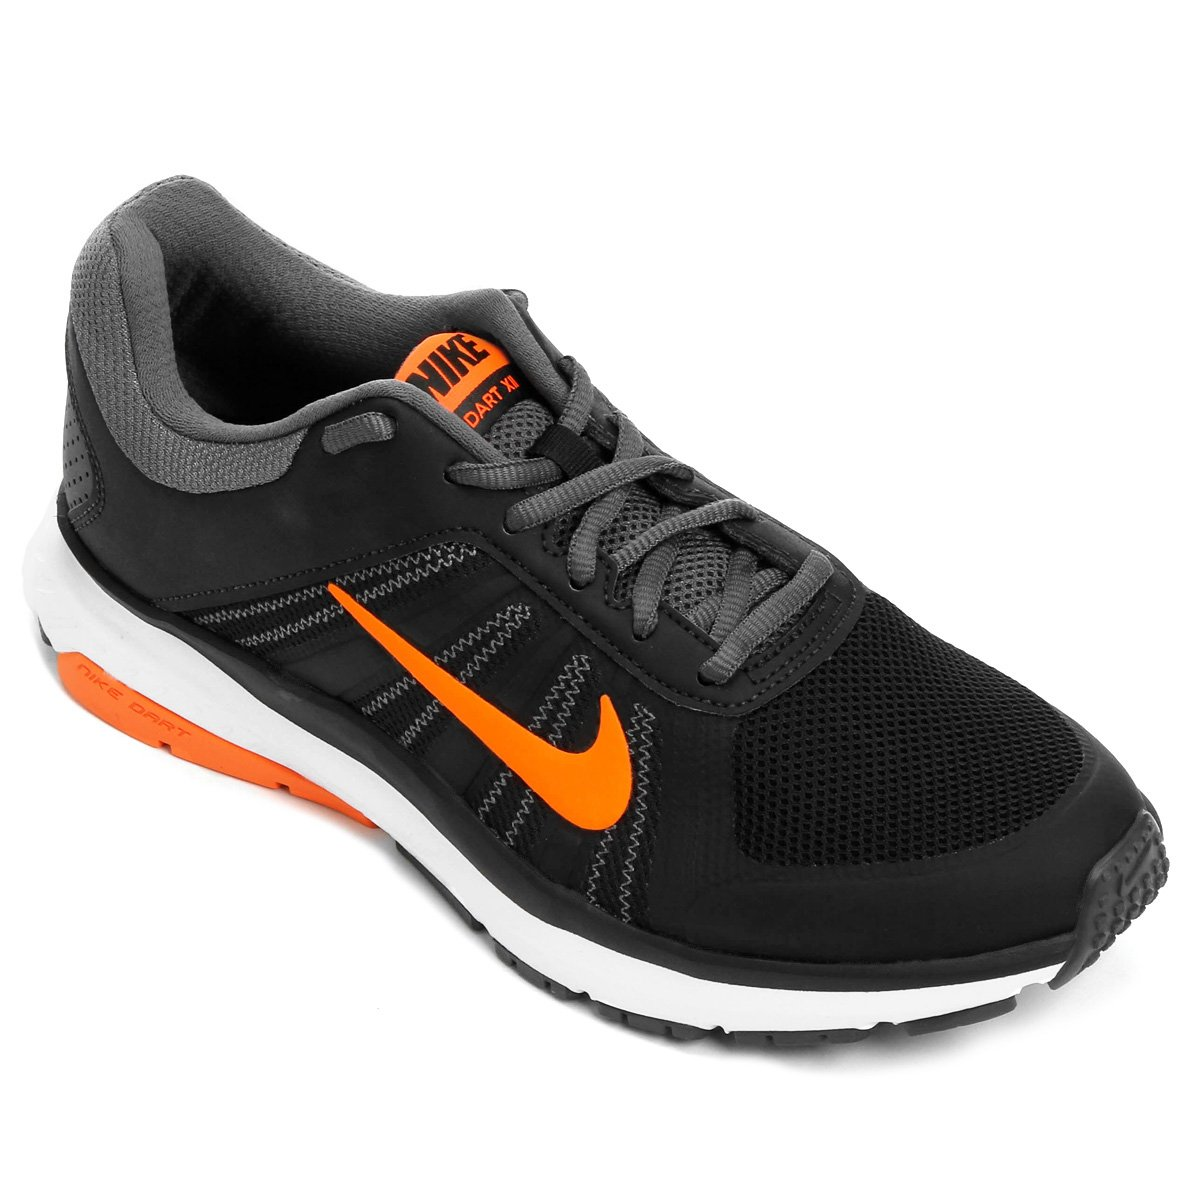 b6c70ff494f37 Tênis Nike Dart 12 MSL Masculino - Preto e Laranja - Compre Agora ...